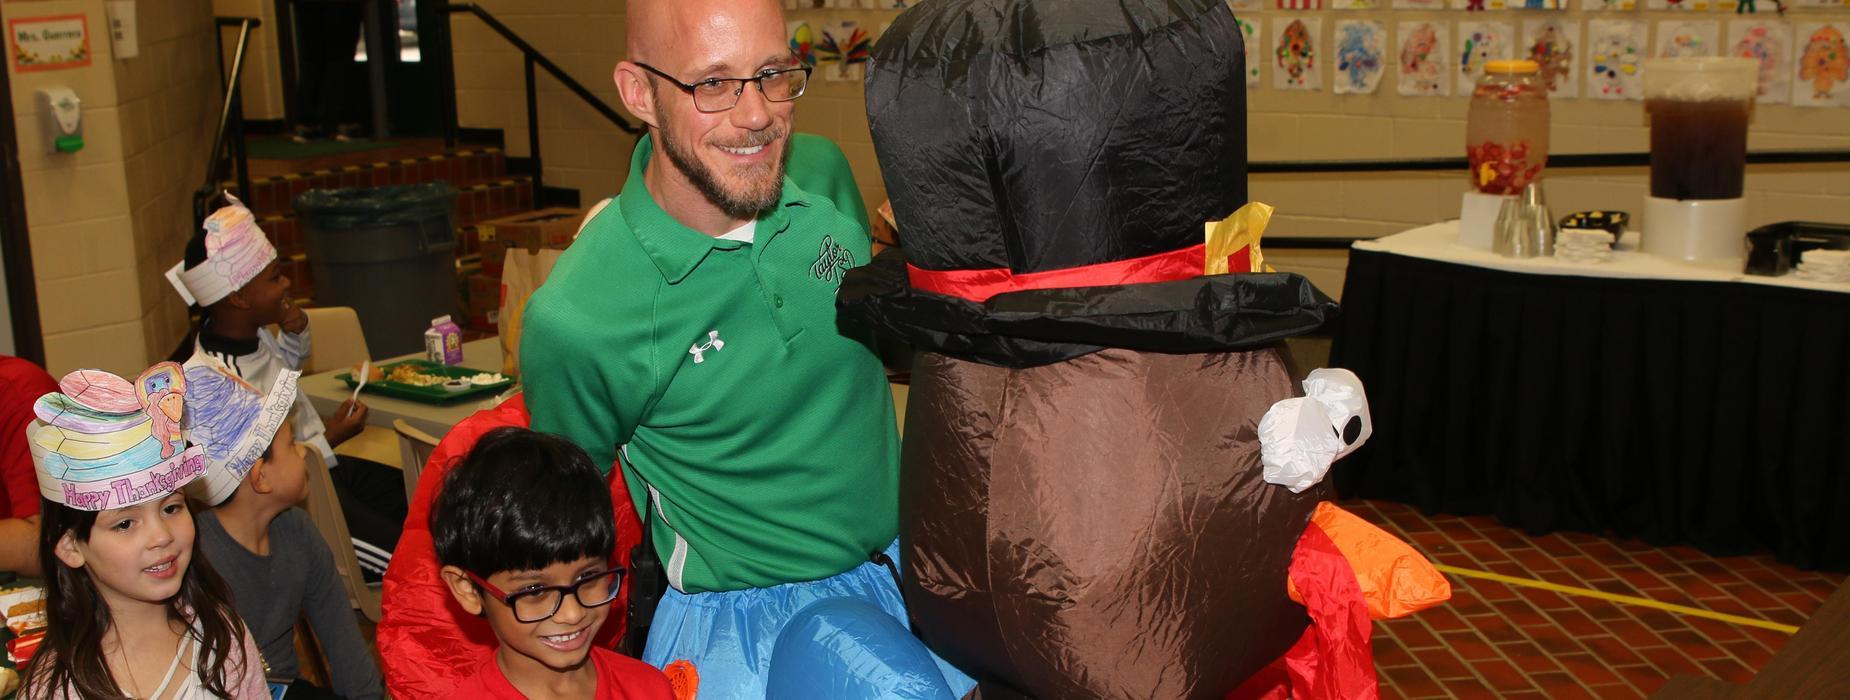 Teacher dressed in turkey costume